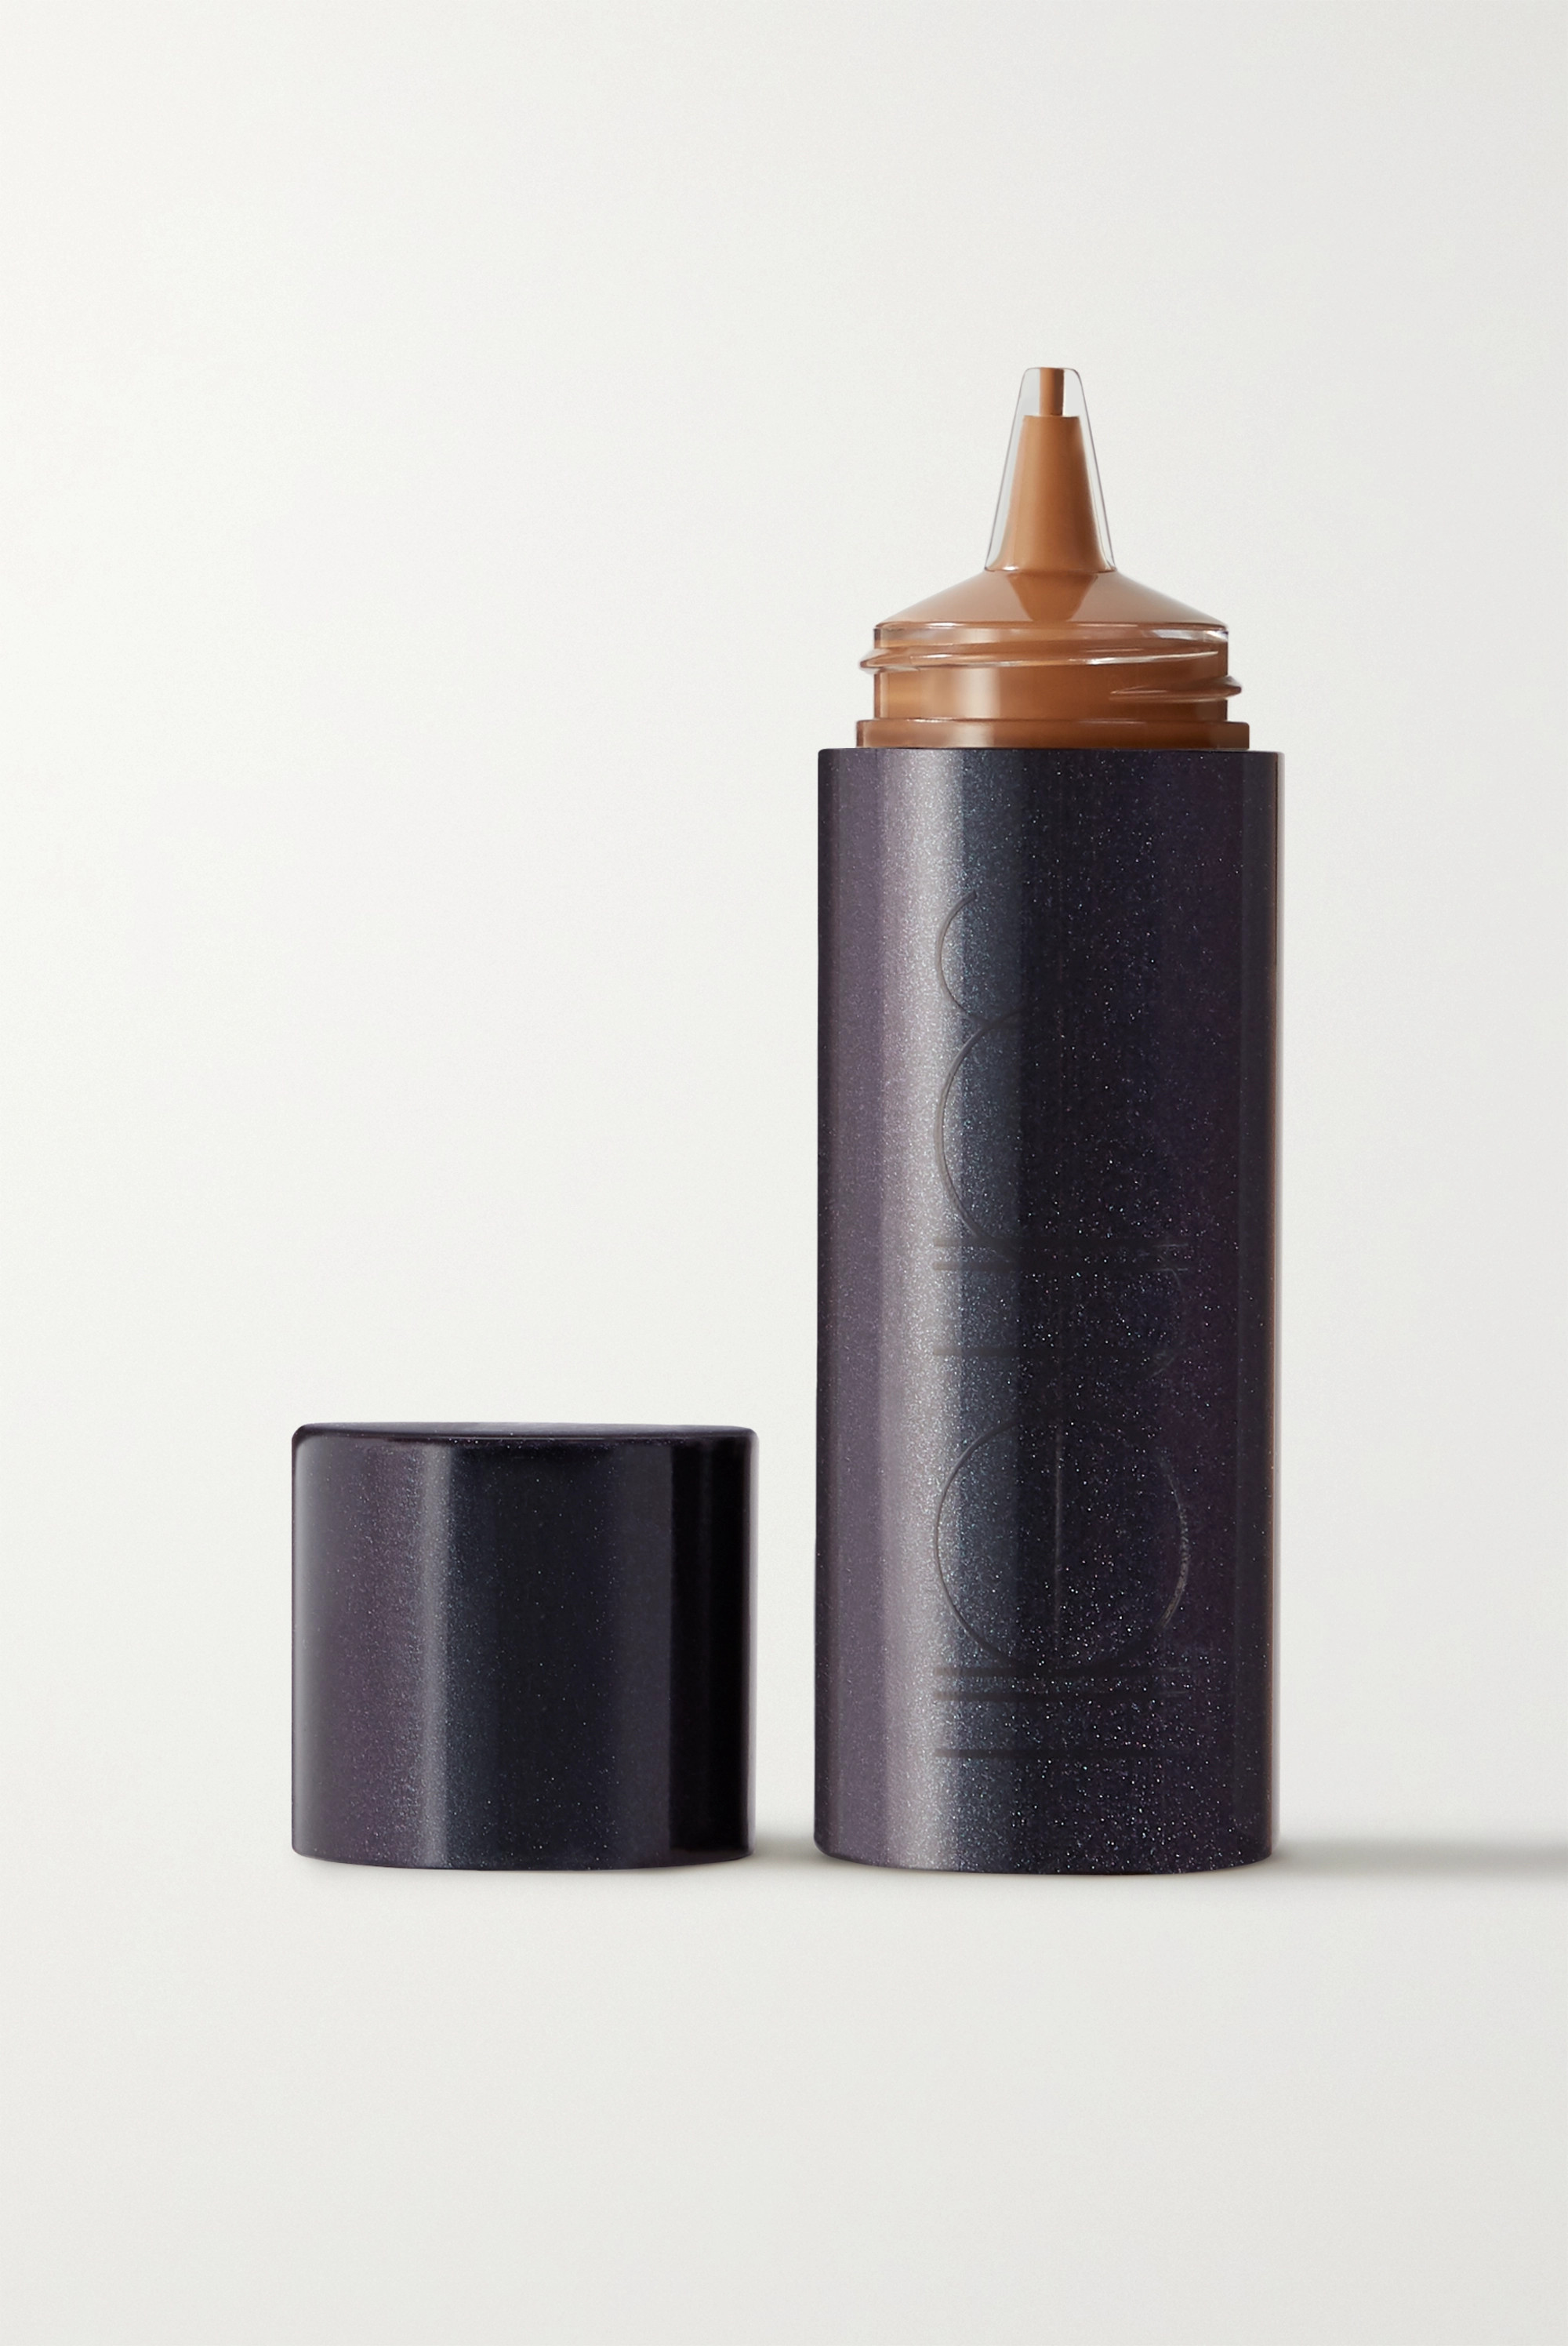 Surratt Beauty Dew Drop Foundation – 14, 19 ml